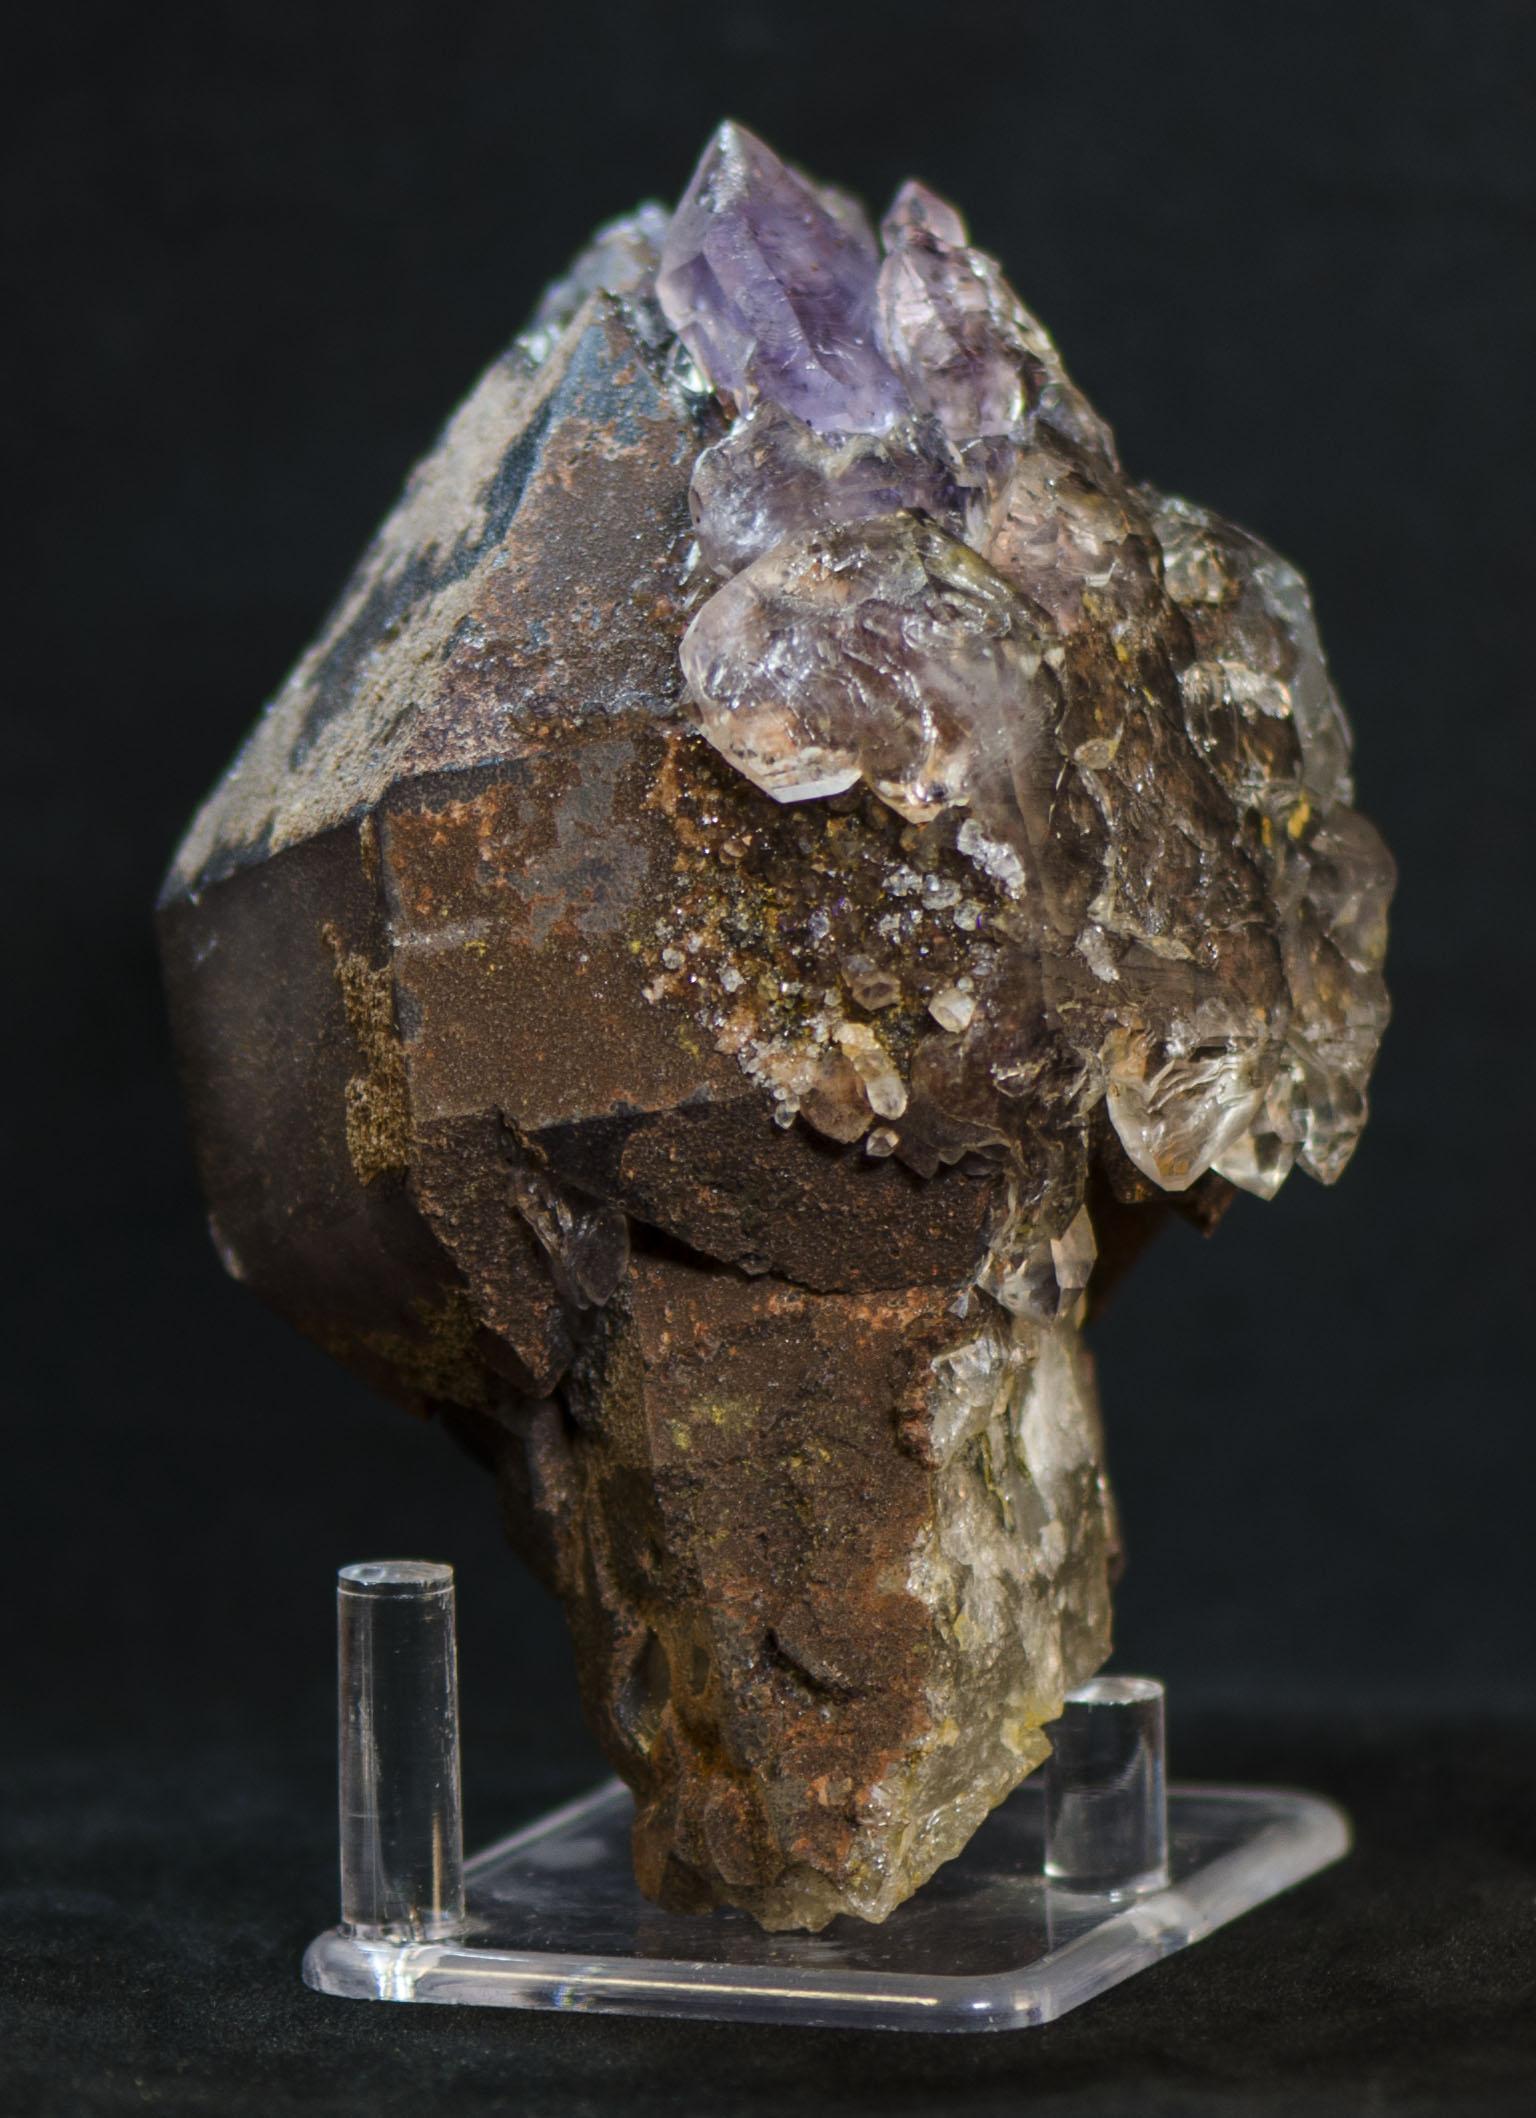 PF 6, Large amethyst scepter